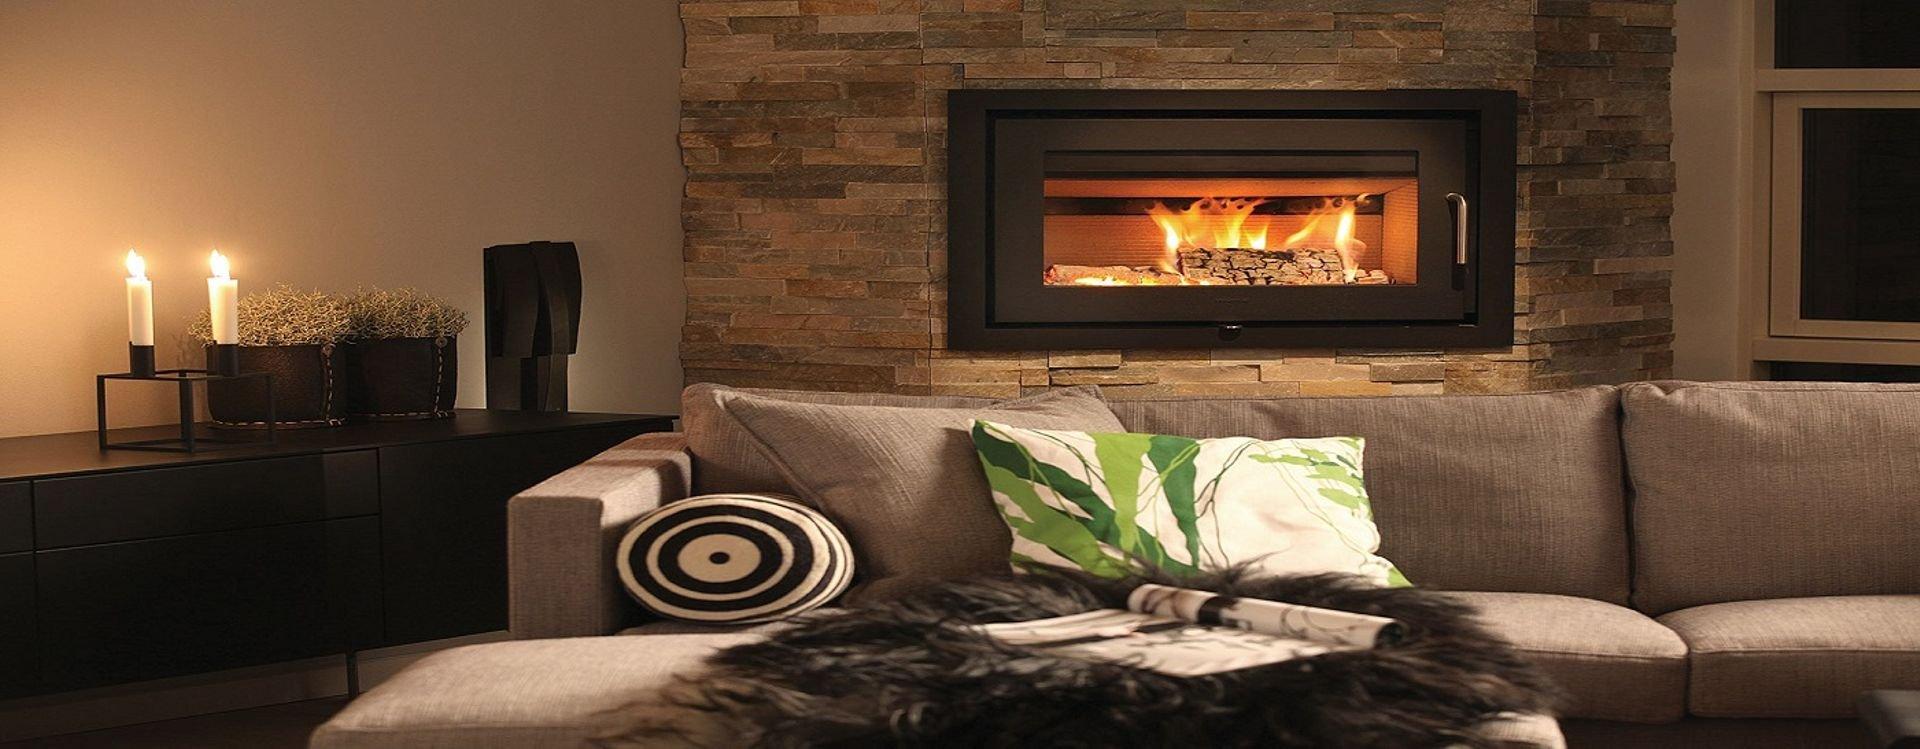 d3942c5b8 تعرفوا إلى أنماط التدفئة المنزلية المختلفة ومزاياها وأفضل خيارات التدفئة  الأمنة والاقتصادية